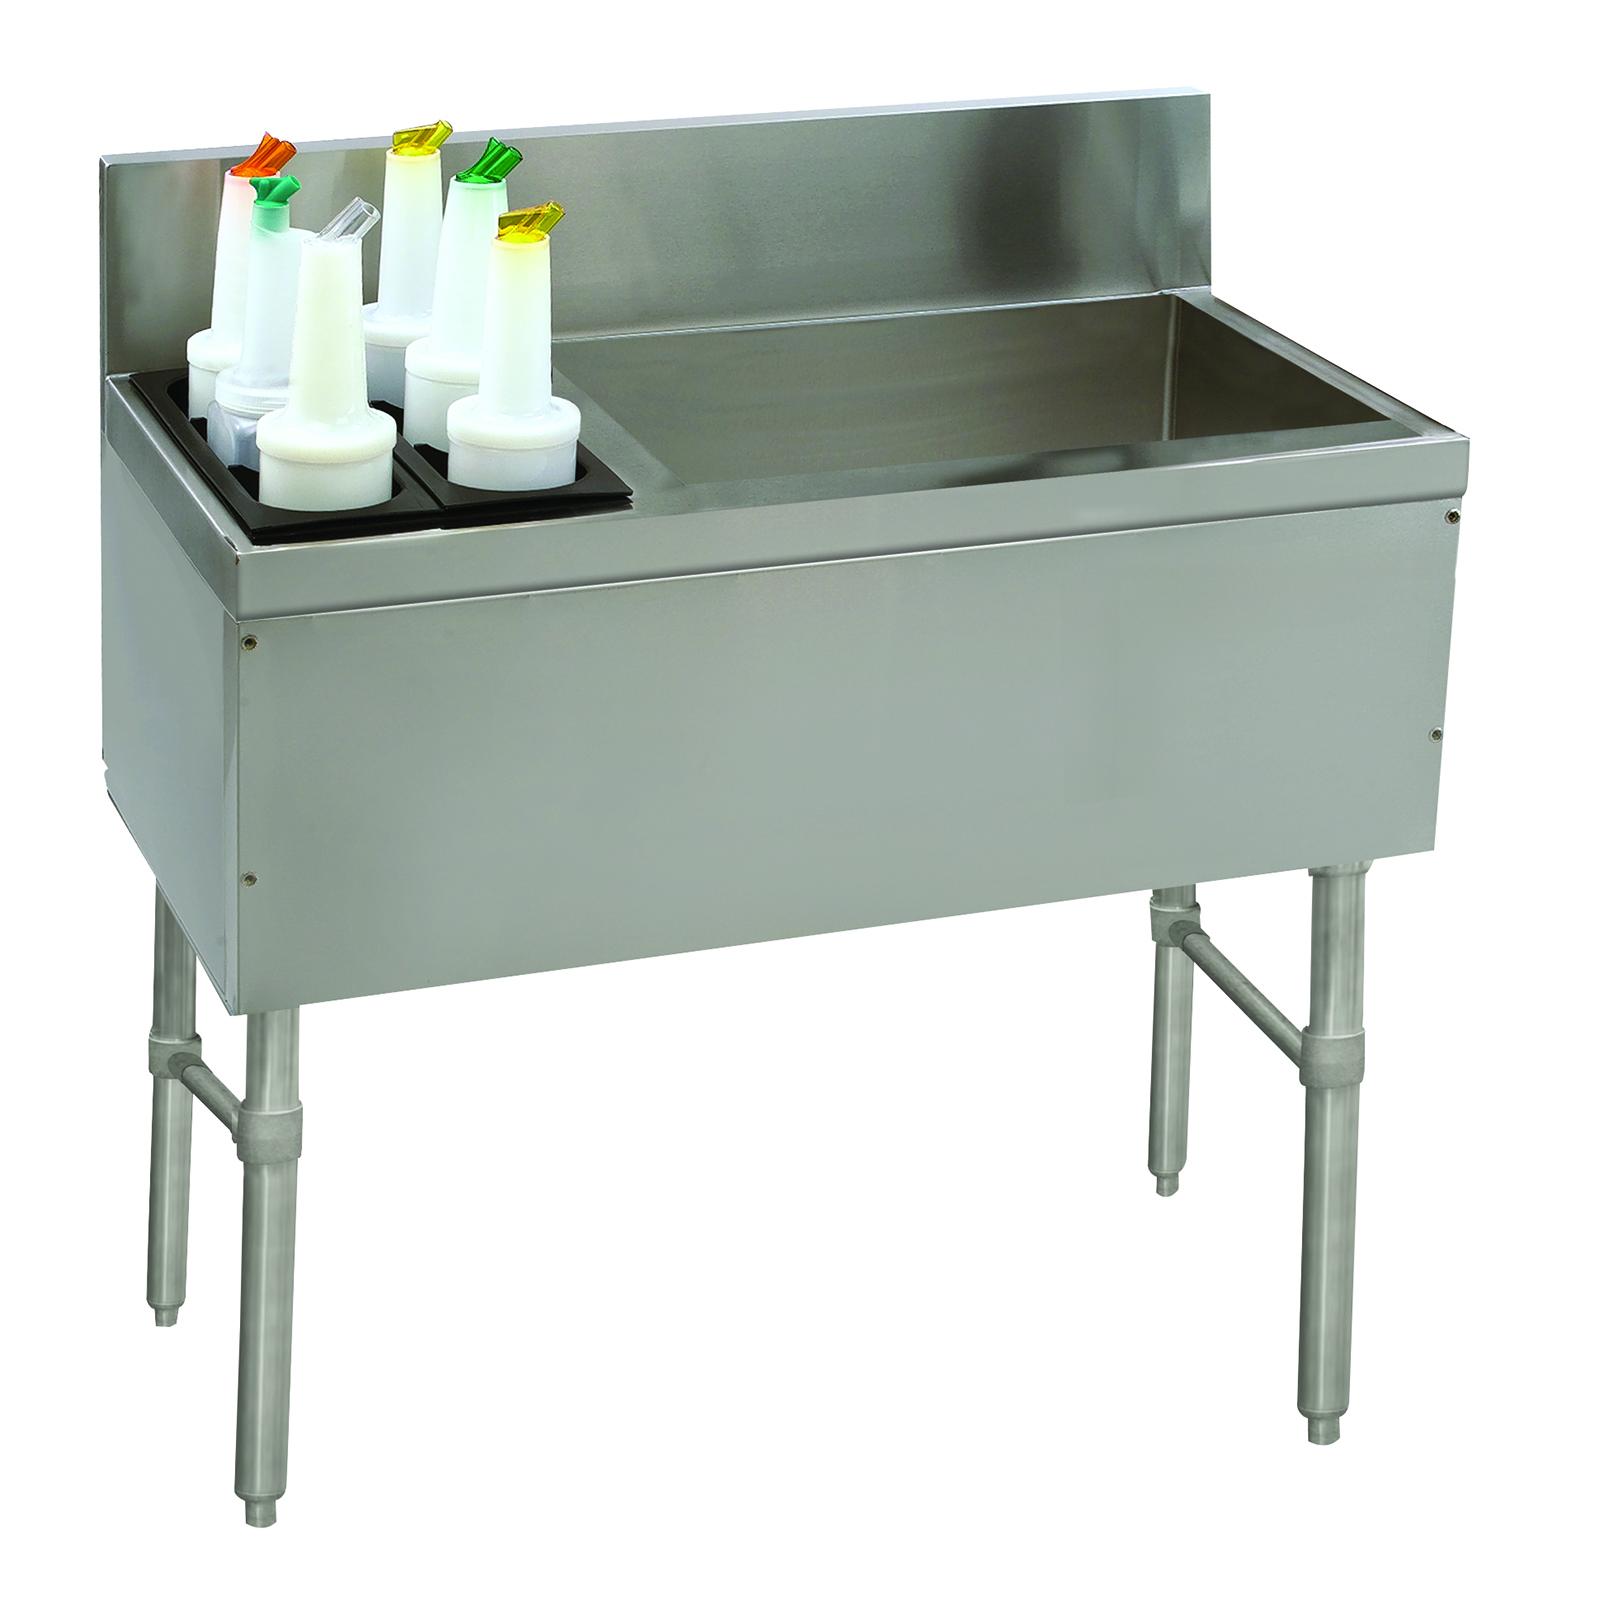 Advance Tabco PRC-19-48R-10 underbar ice bin/cocktail station, bottle well bin